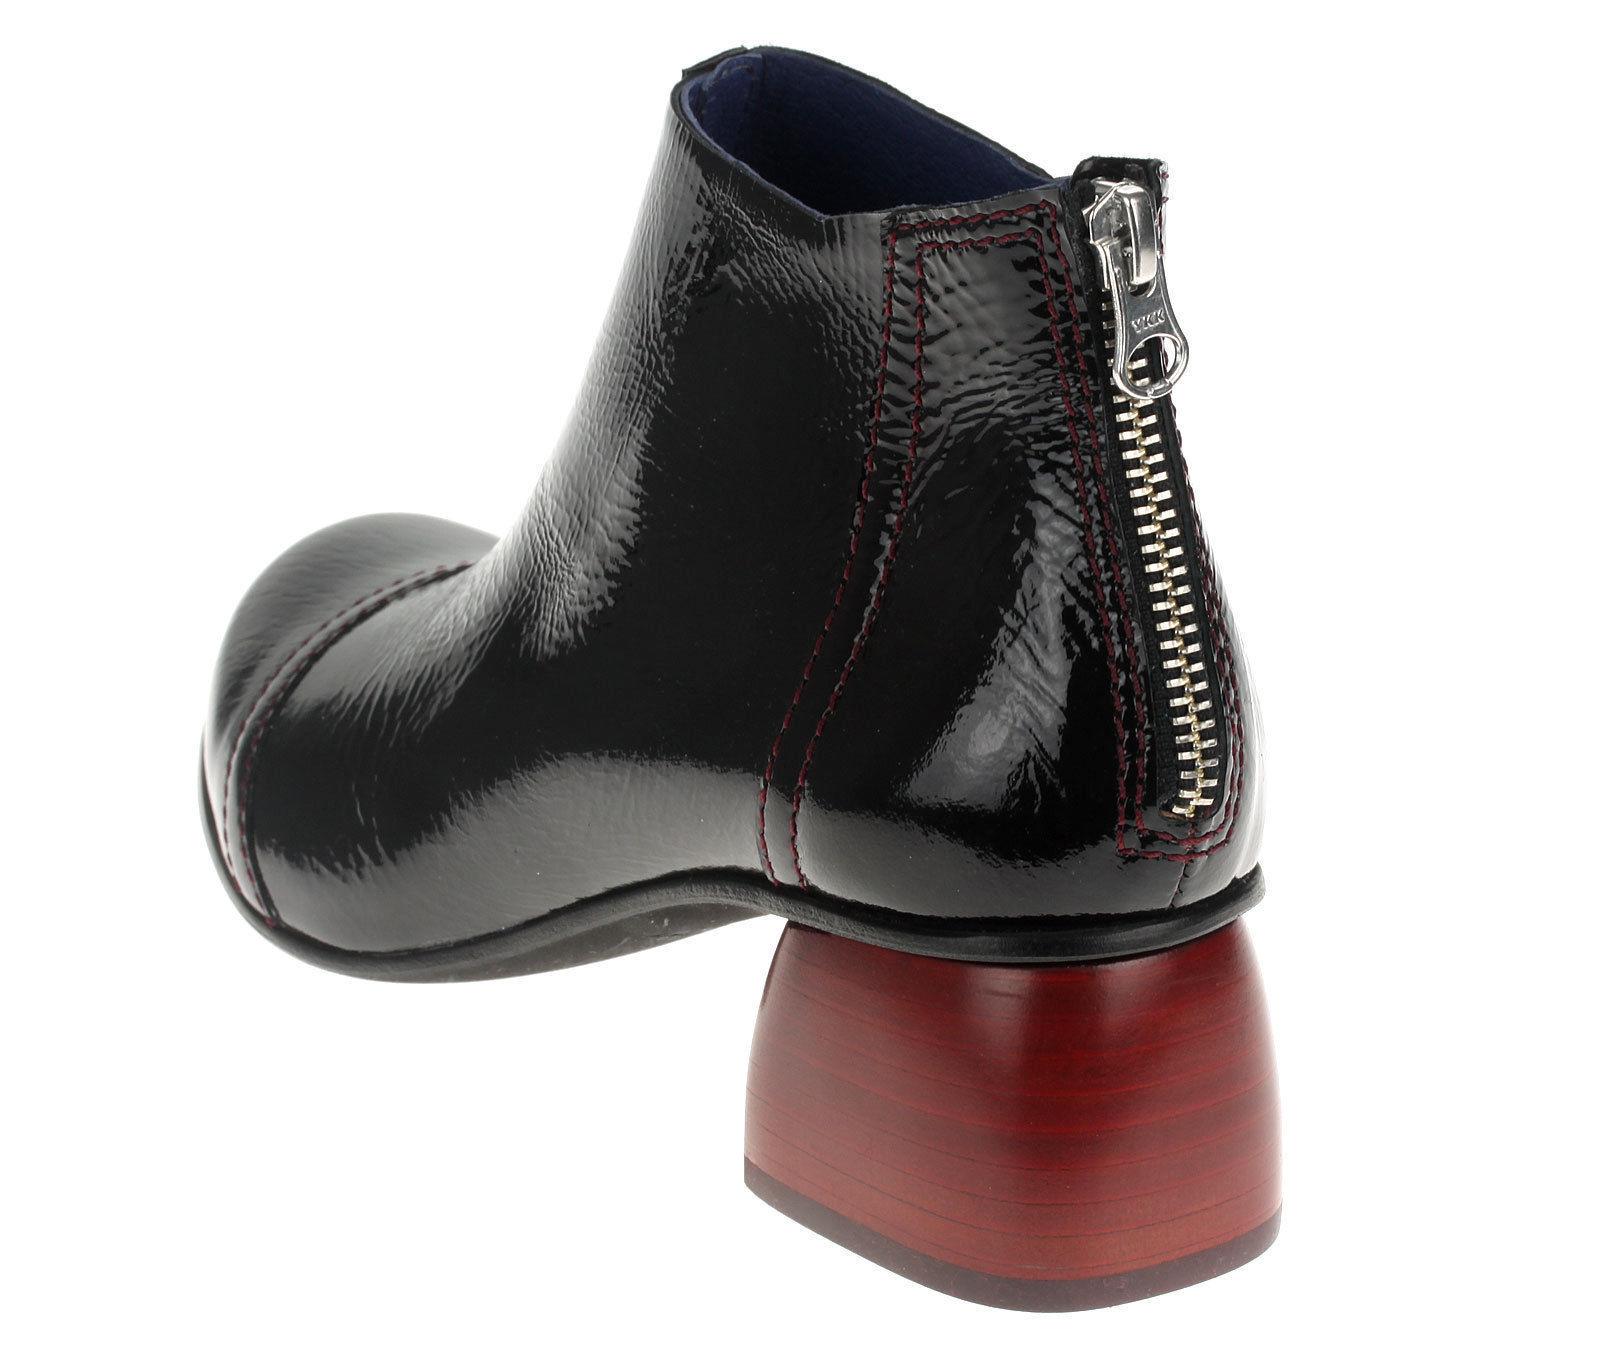 Iim77 chaussures Femme Bottines Véritable Cuir Cuir Cuir bottes démarragey cuir verni 5134 Noir 27d75c